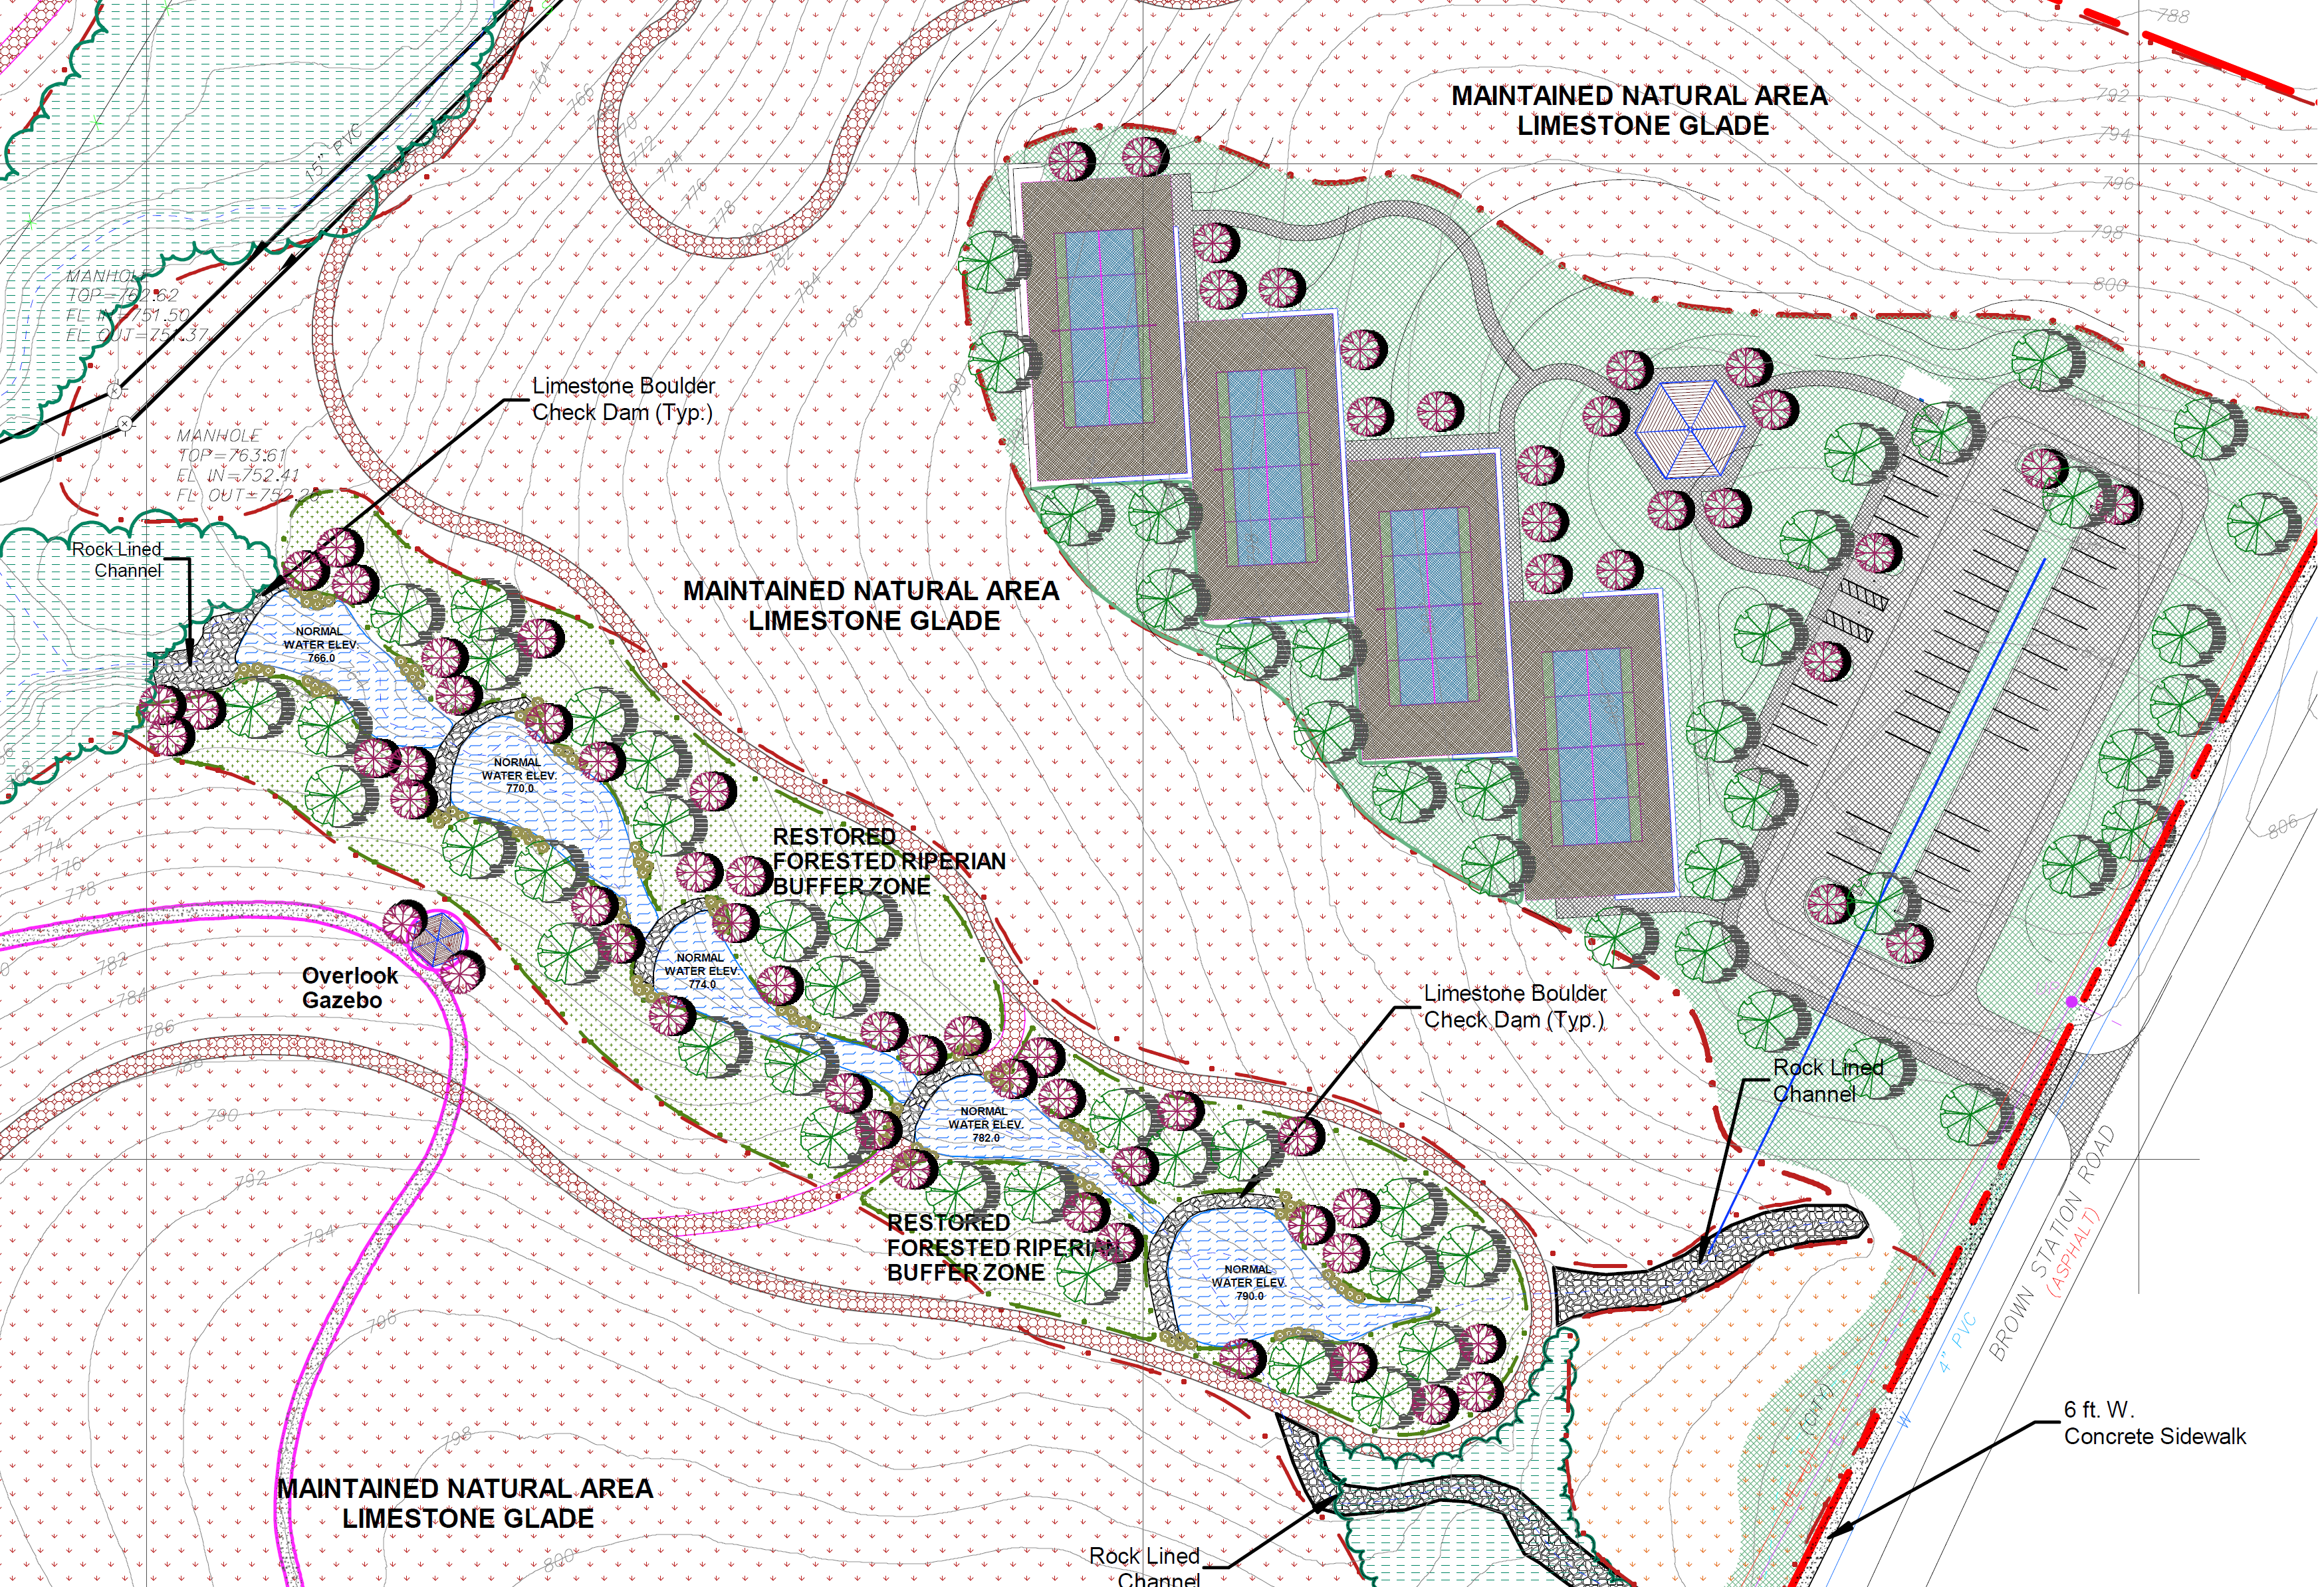 Future Riperian Corridor & Tennis